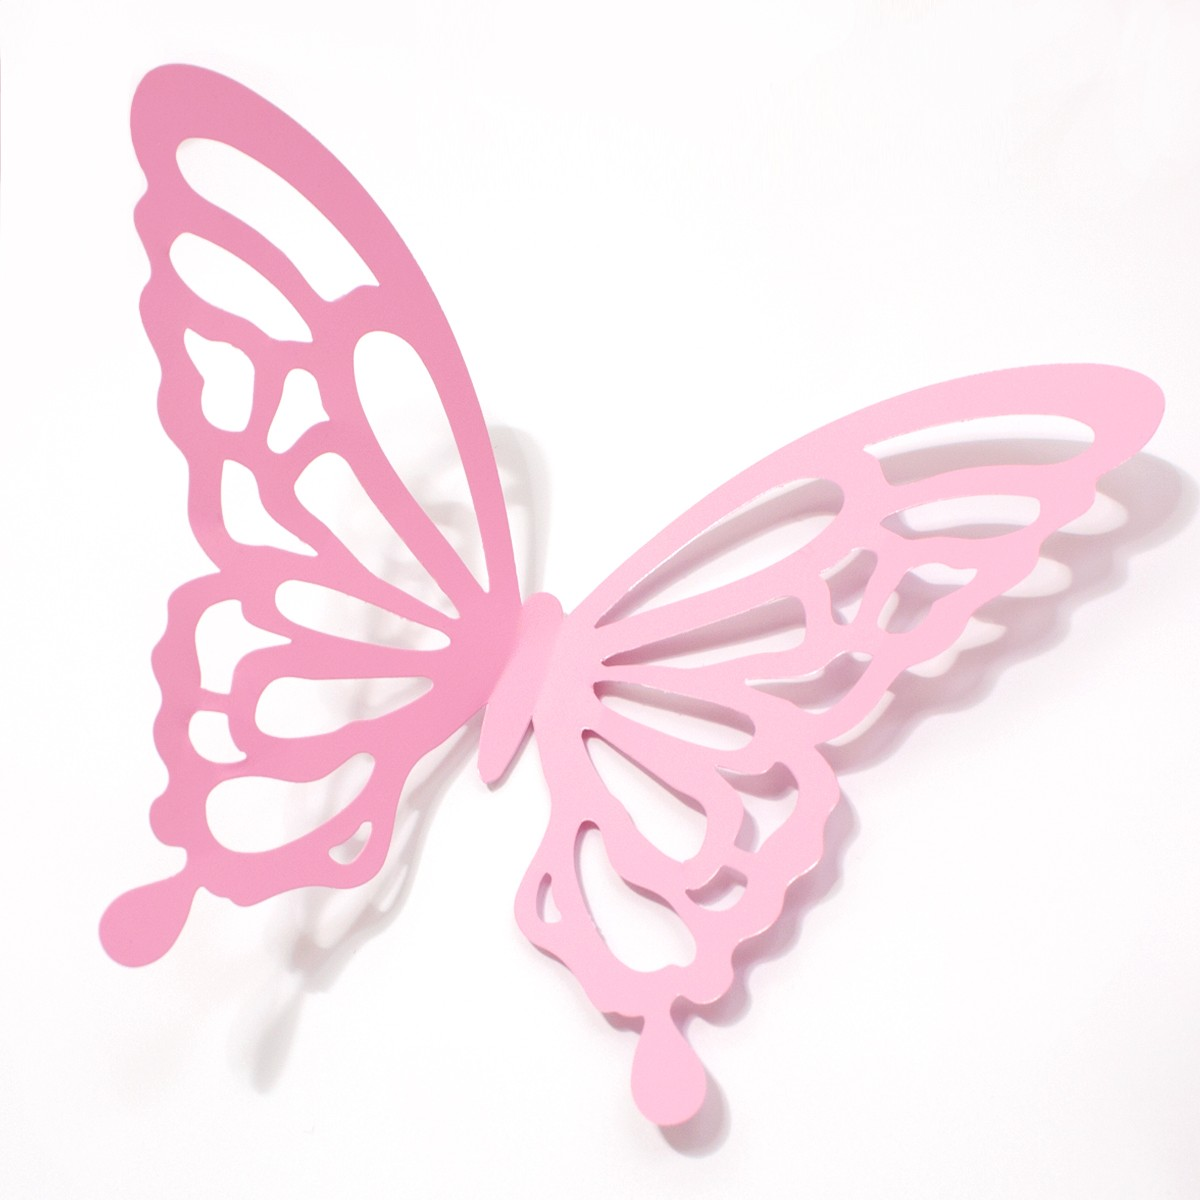 wandtattoo 3d schmetterlinge rosa mit ornamenten muster. Black Bedroom Furniture Sets. Home Design Ideas